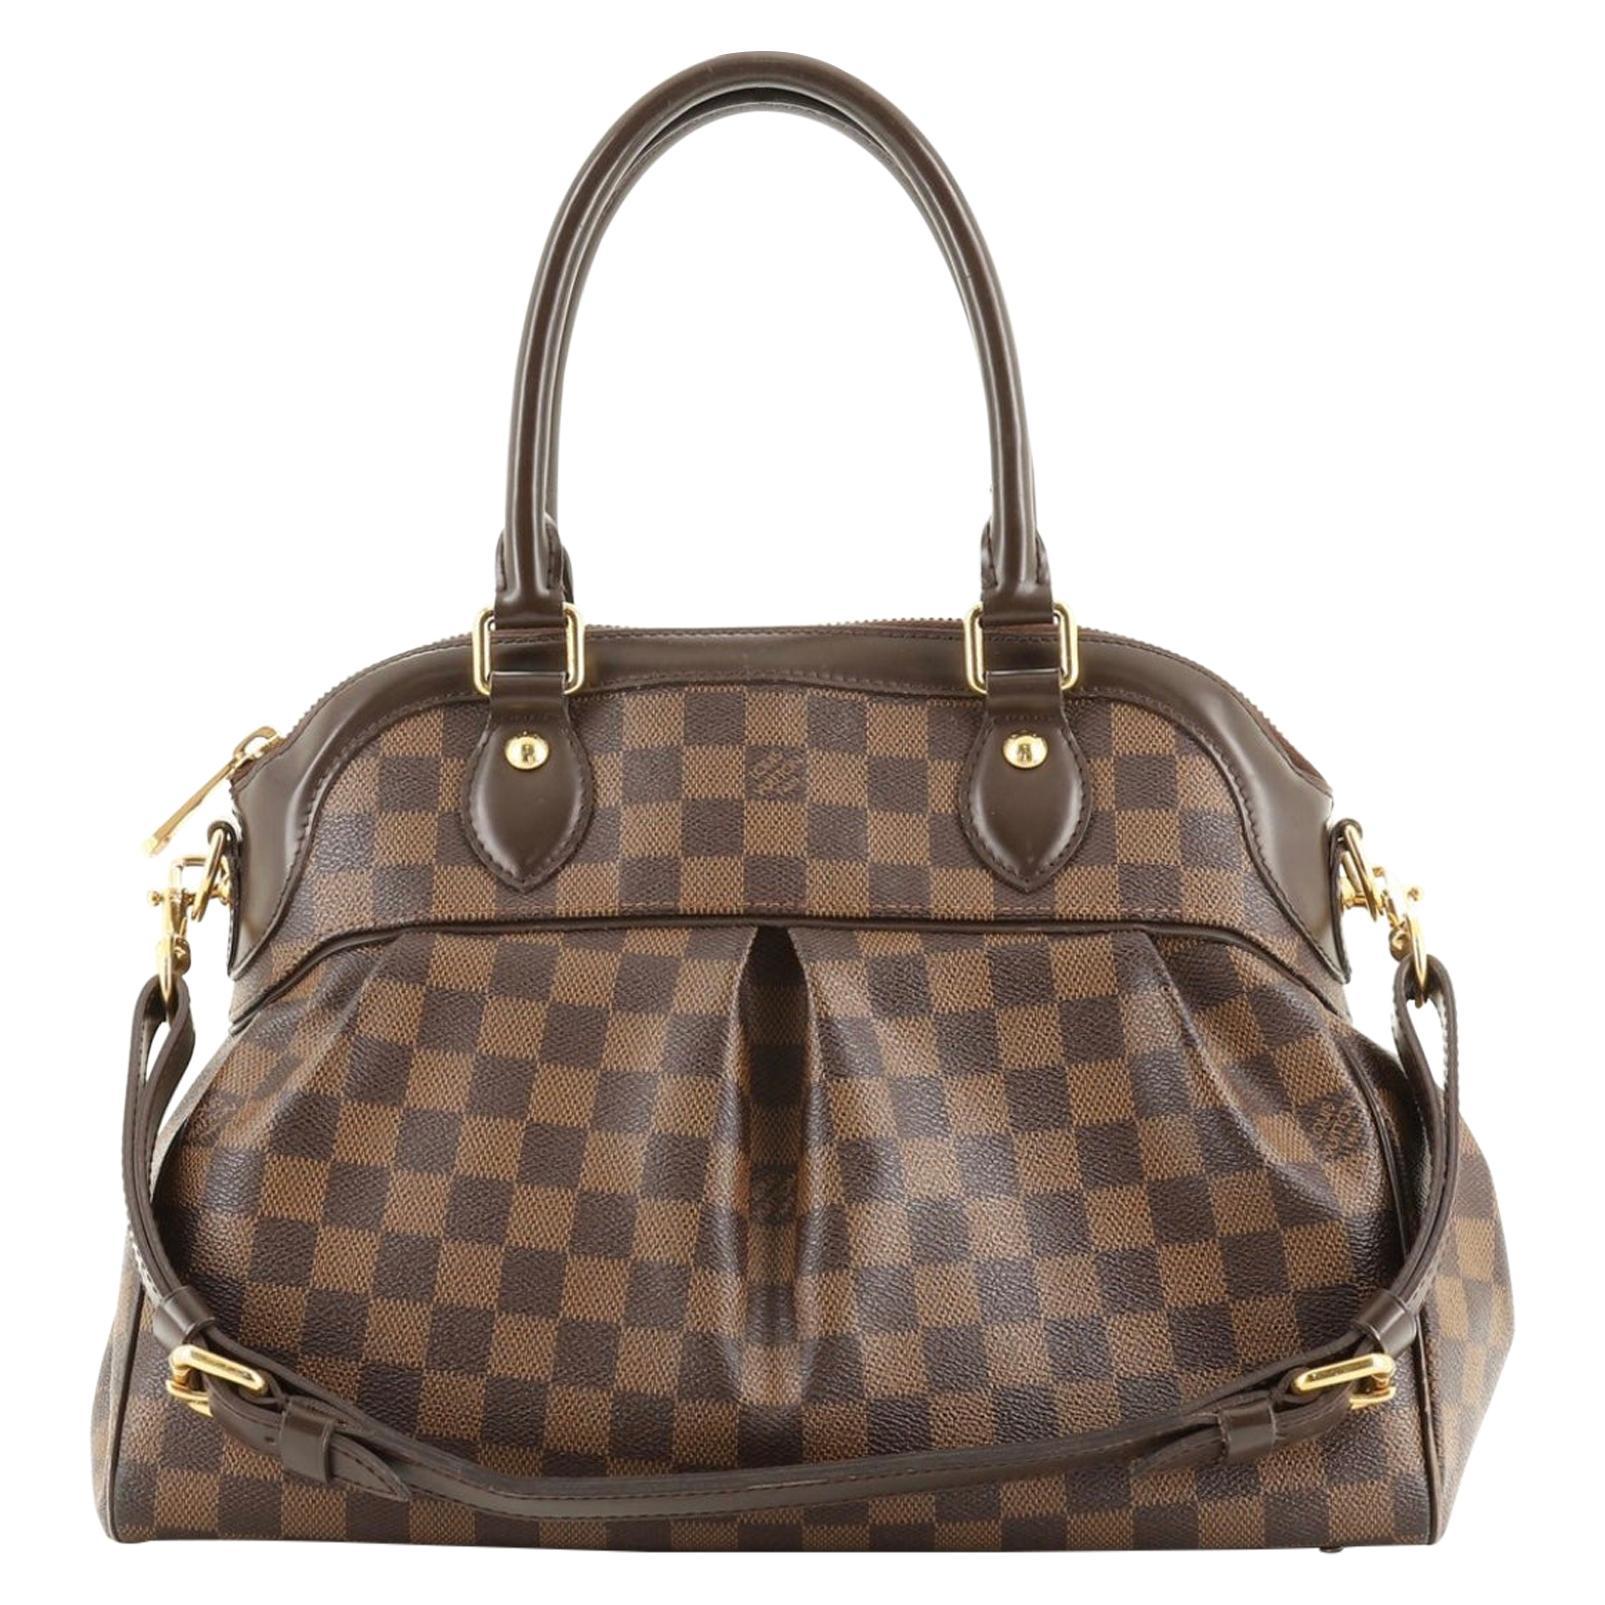 LOUIS VUITTON Damier  Ebene Canvas Trevi  PM Bag, Like New